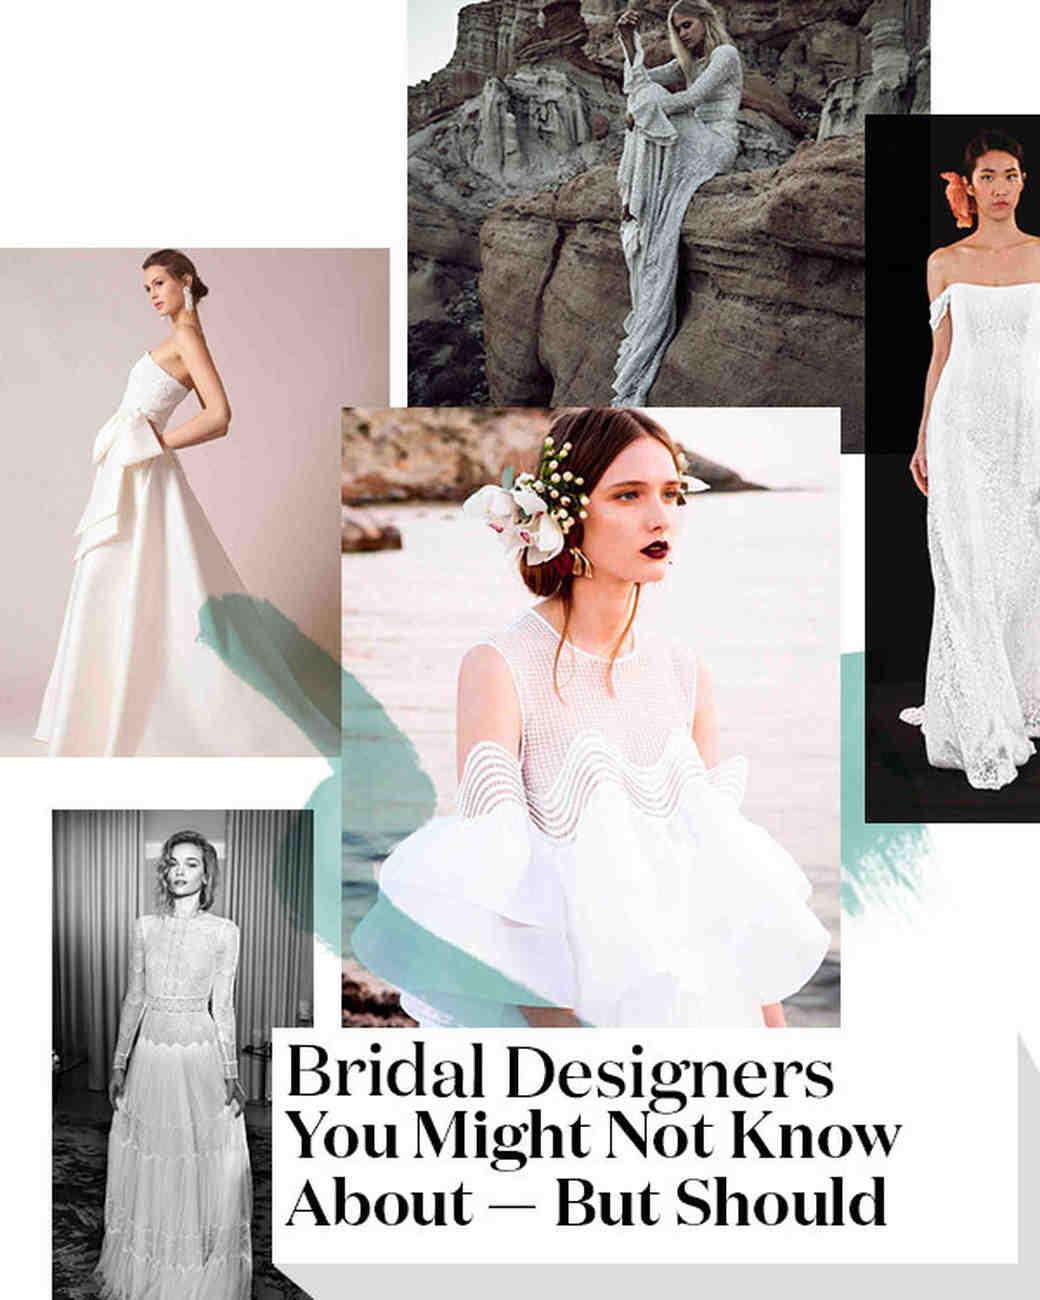 Jackie O Style Wedding Dress 76 Awesome Bridal Designers You Might